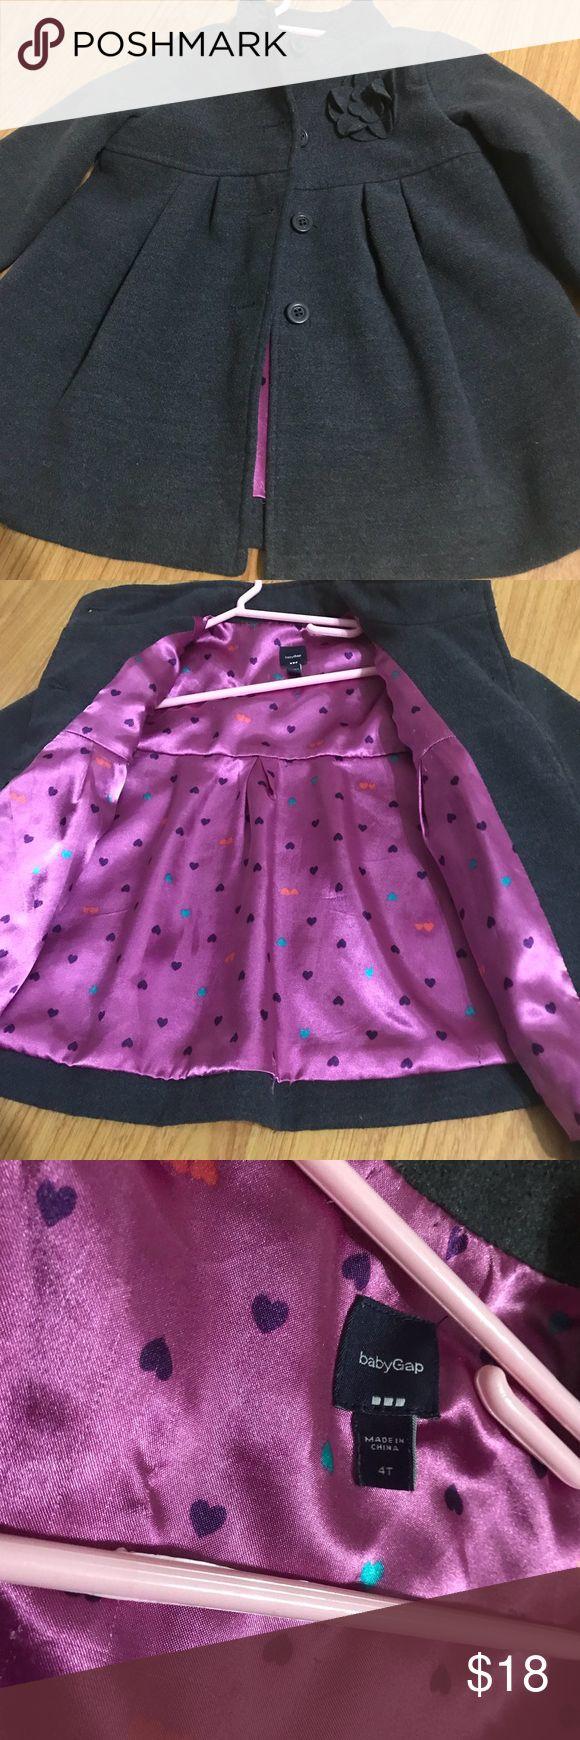 Gap jacket Gap jacket GAP Jackets & Coats Blazers